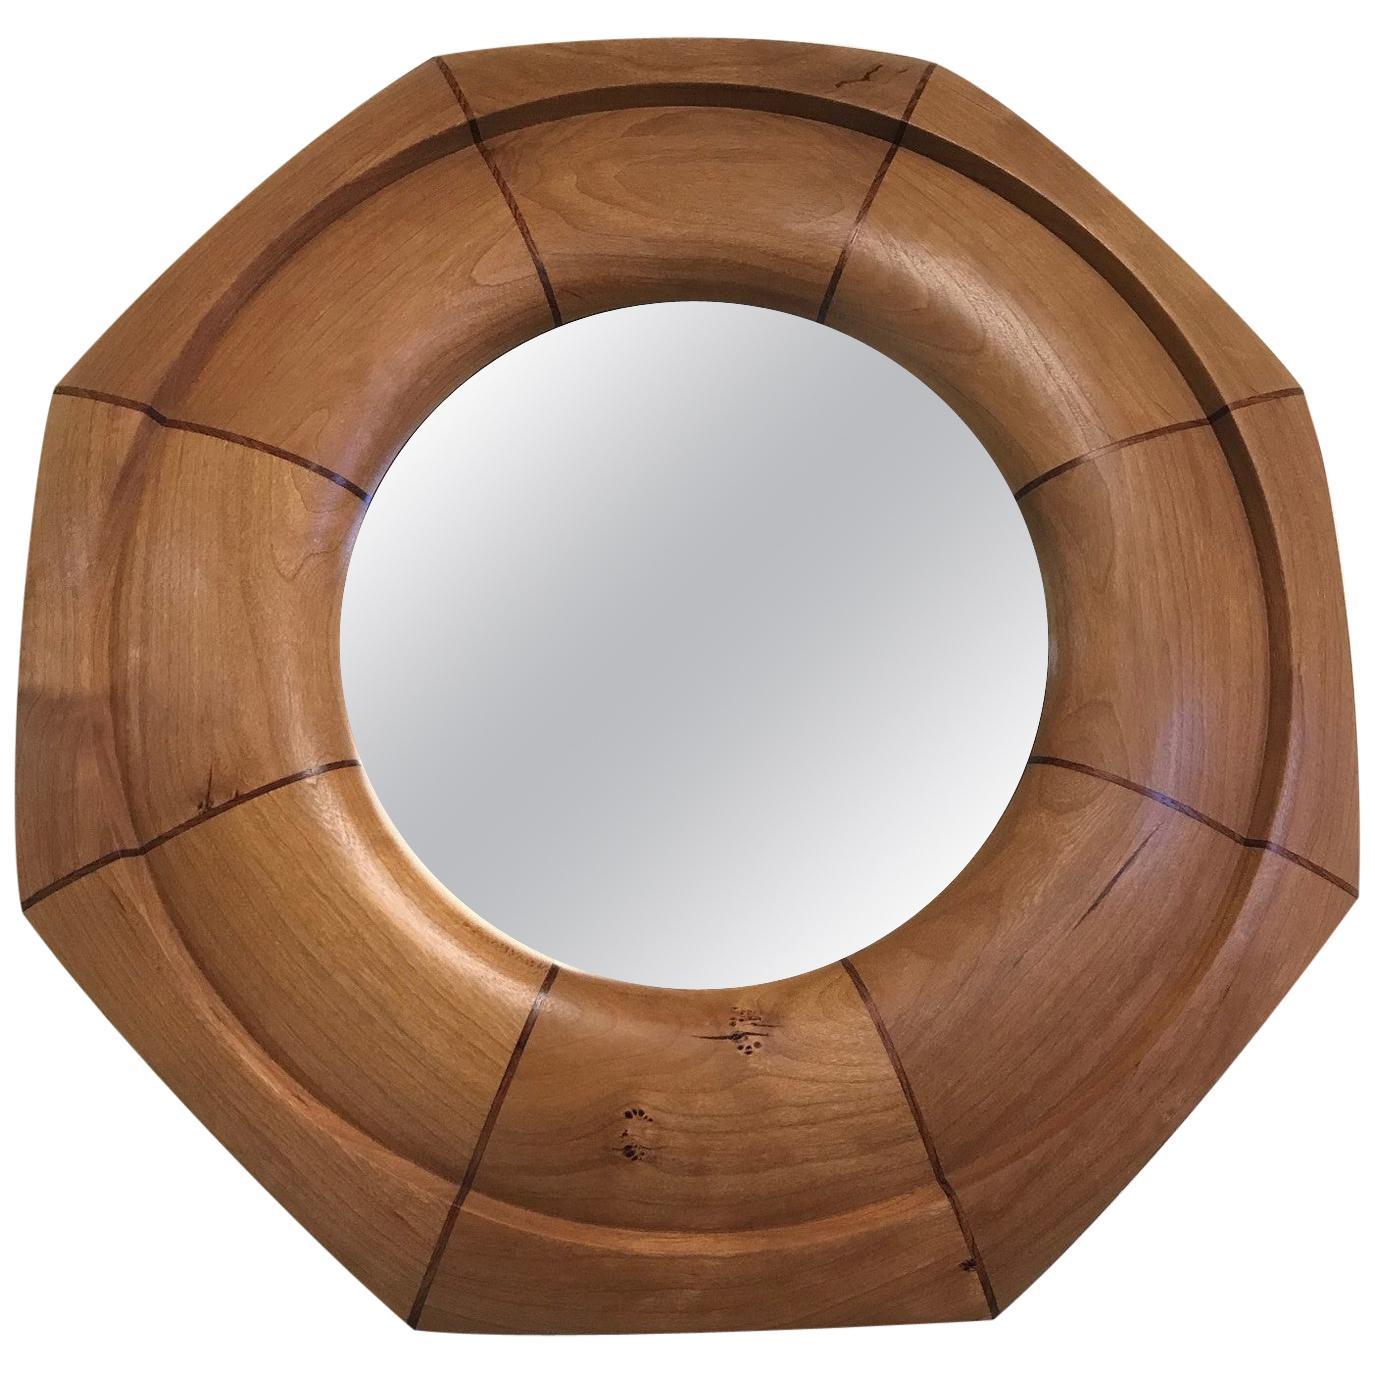 Custom Solid Cherrywood with Walnut Inlay Octagonal Mirror